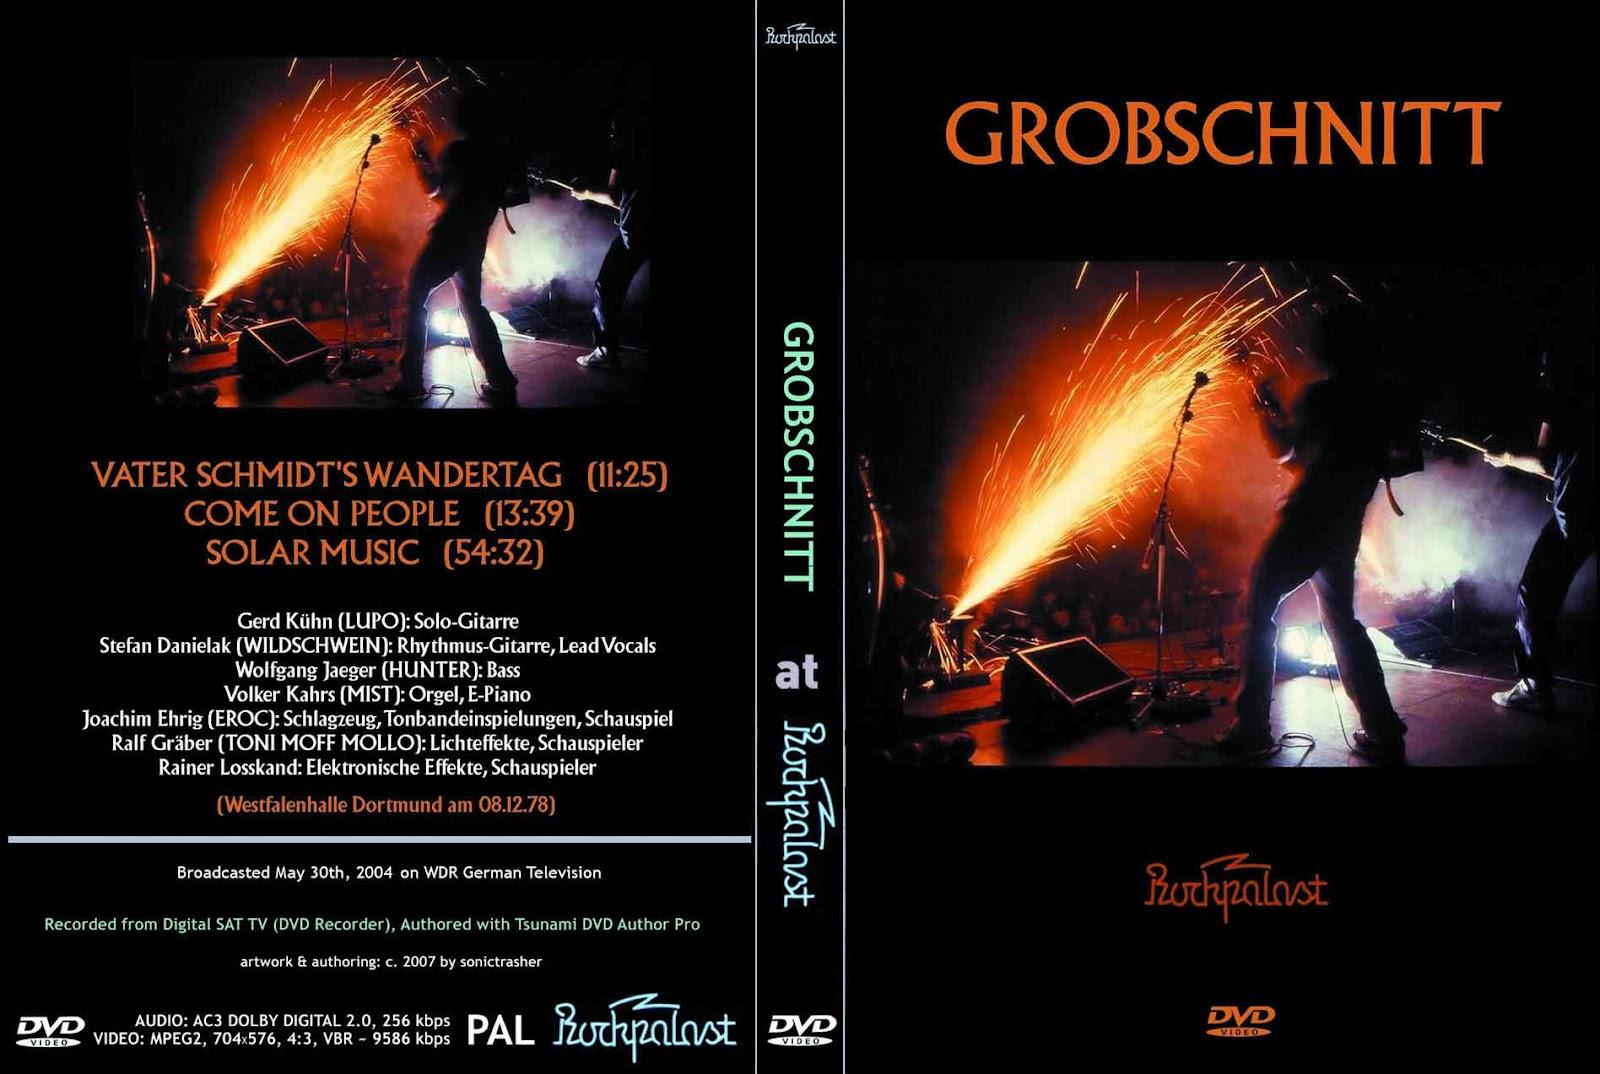 Download Free Grobschnitt Rockpalast